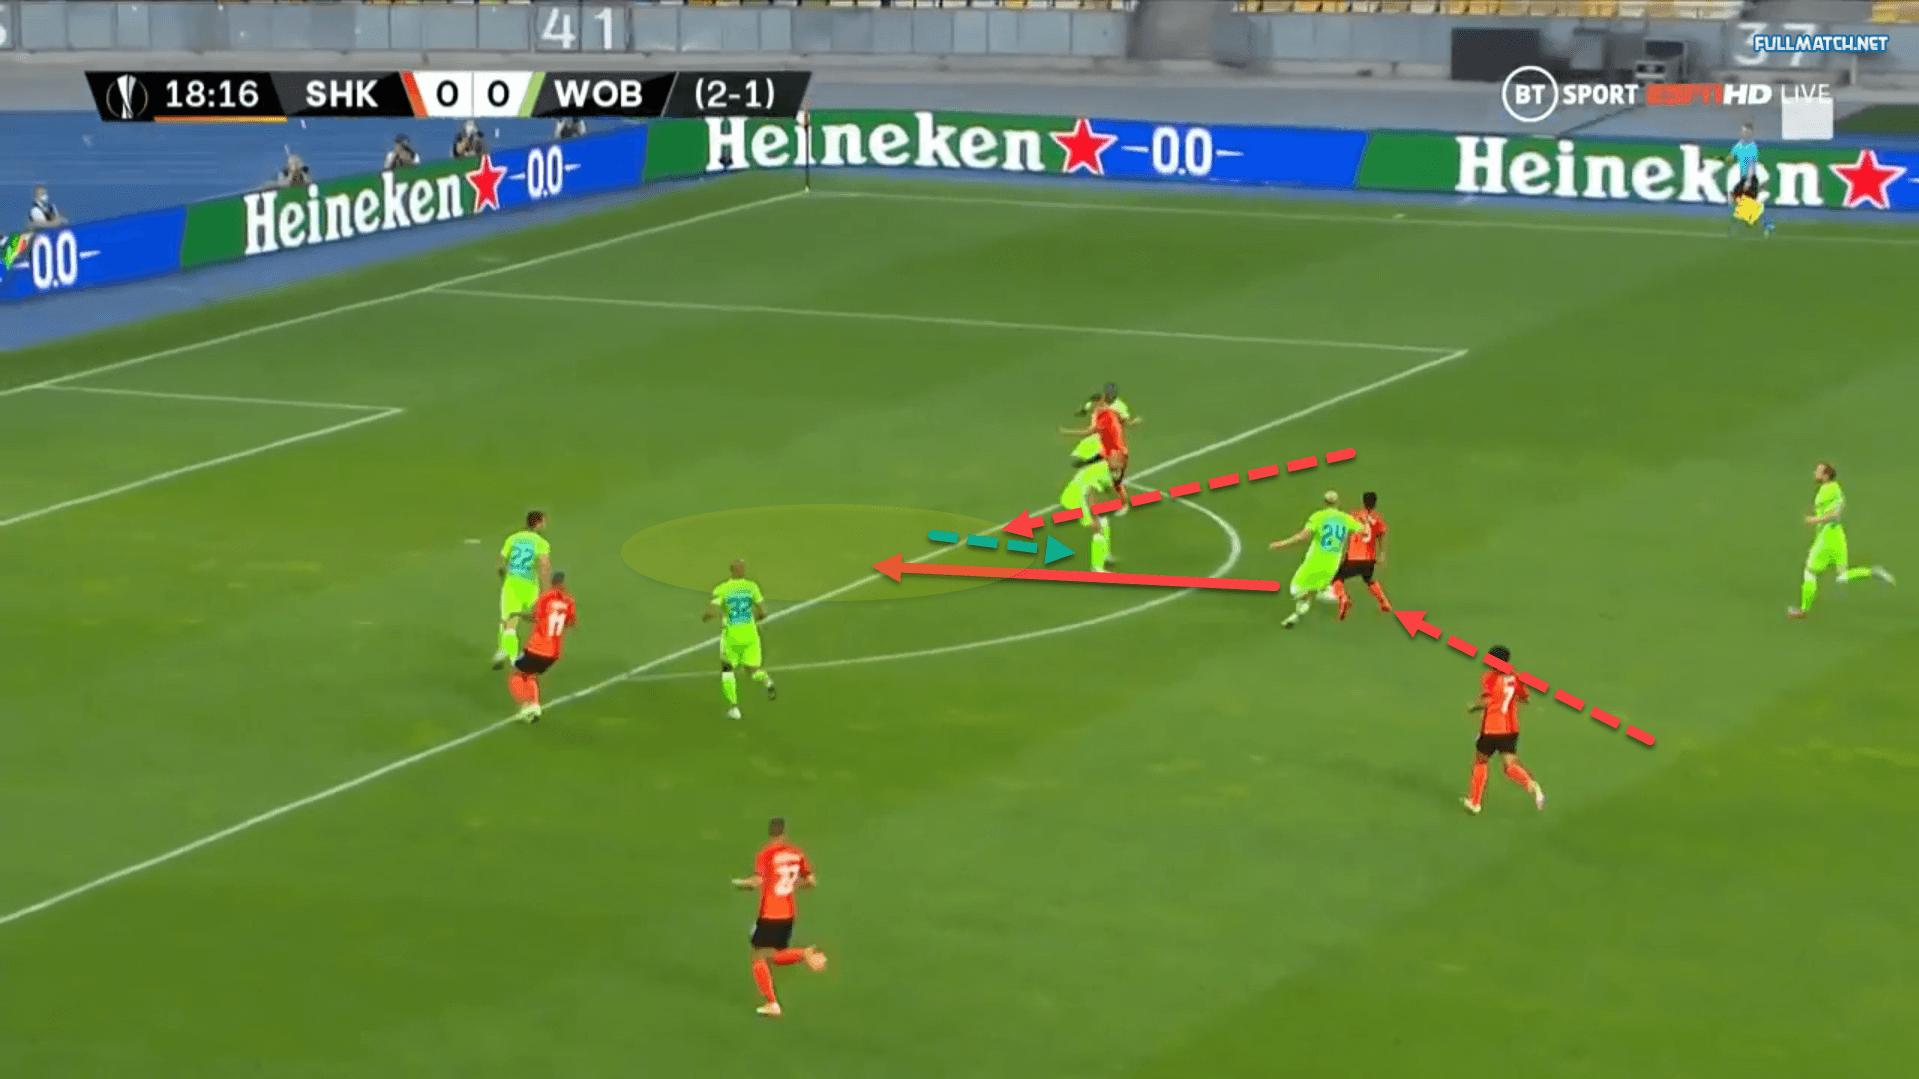 UEFA Europa League 2019/20: Shakhtar Donetsk vs Wolfsburg - tactical analysis tactics